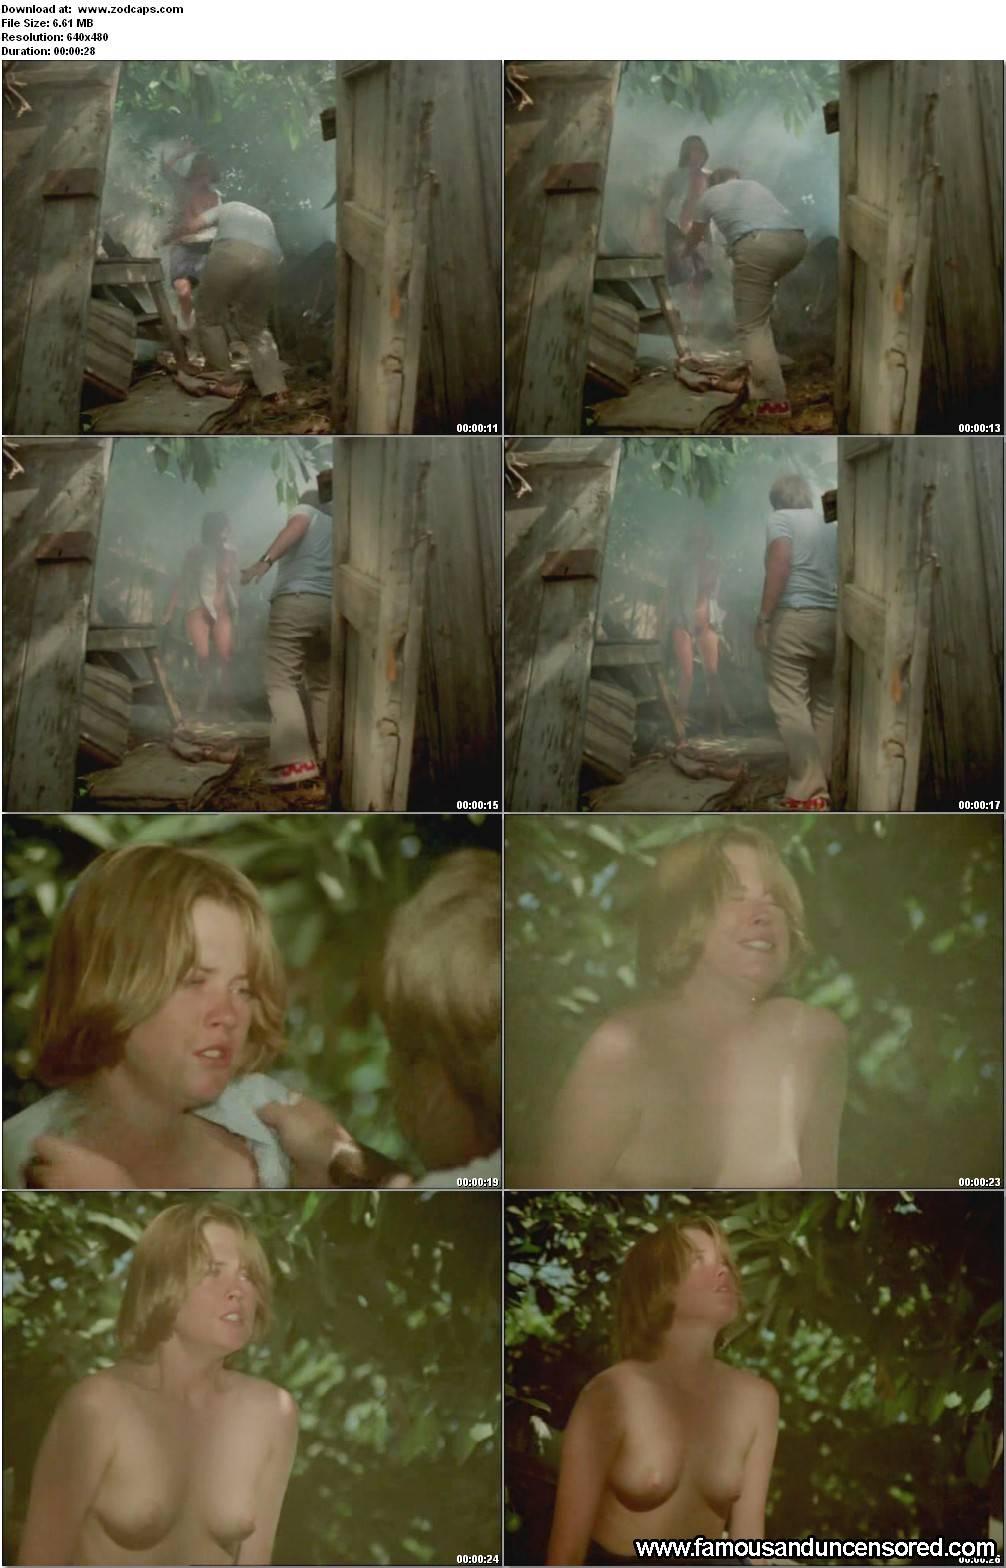 Melanie griffith nude in the garden